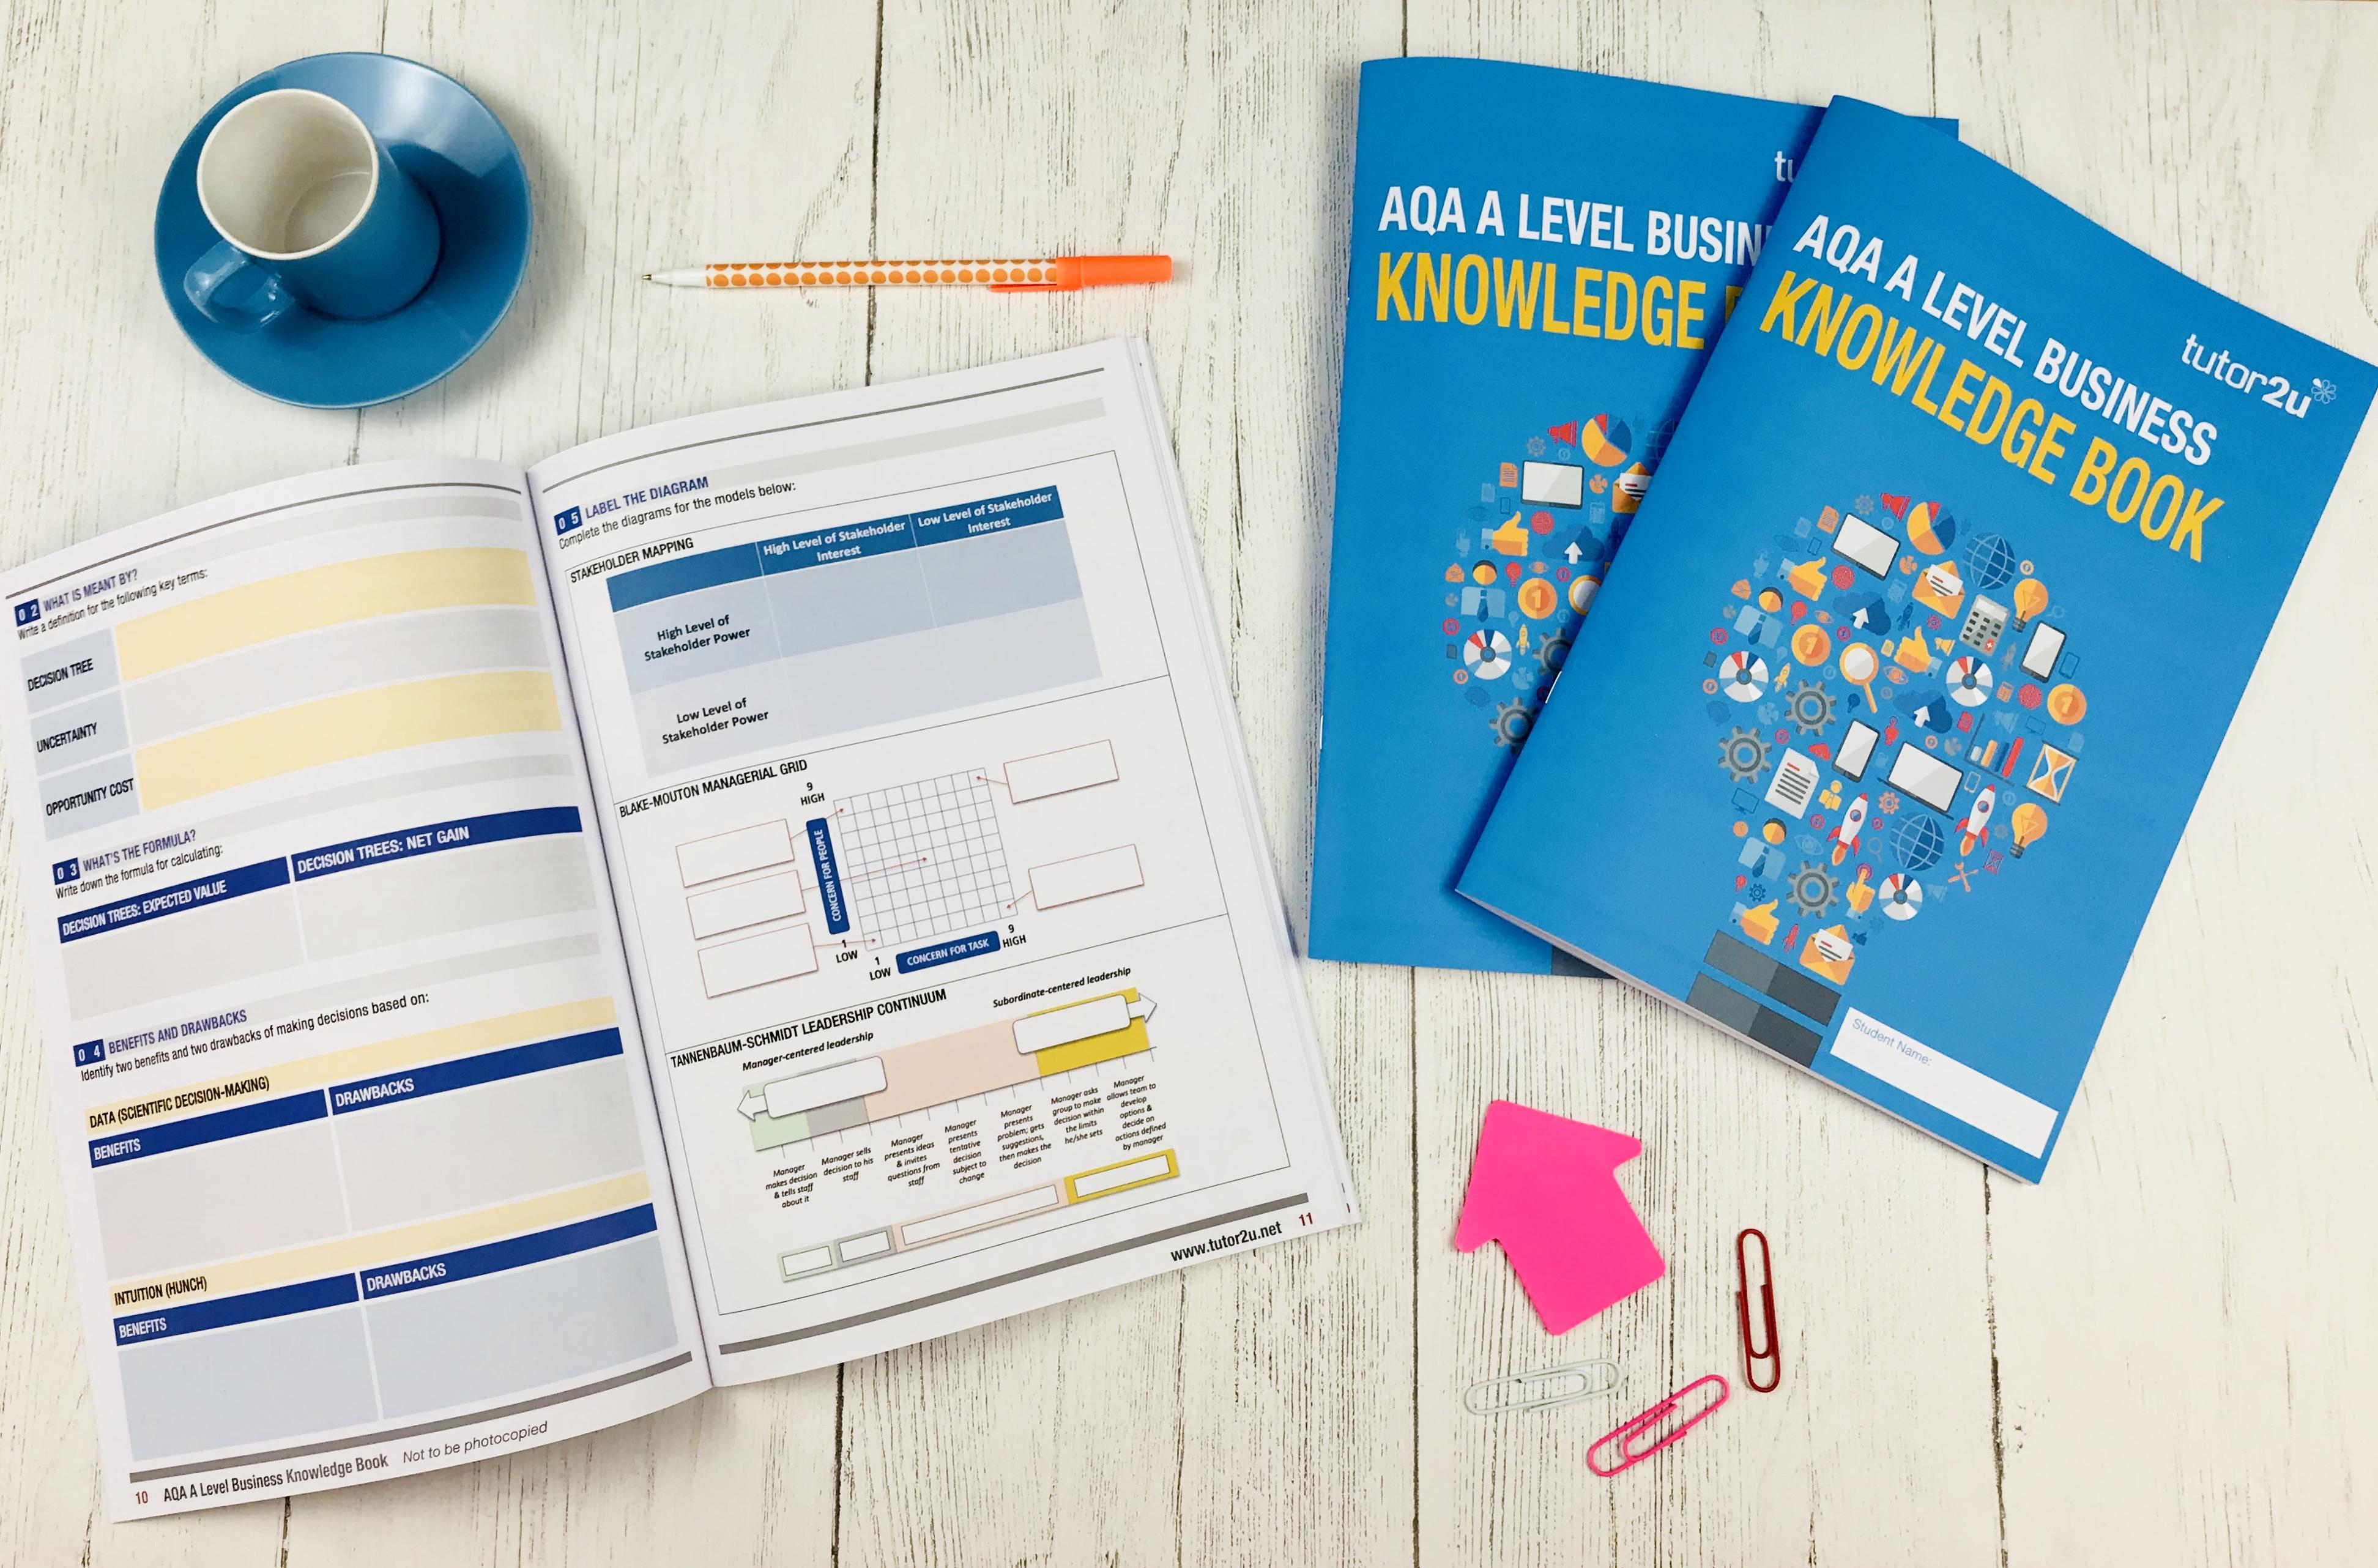 Aqa A Level Business Knowledge Book Strategies Tutor2u Business